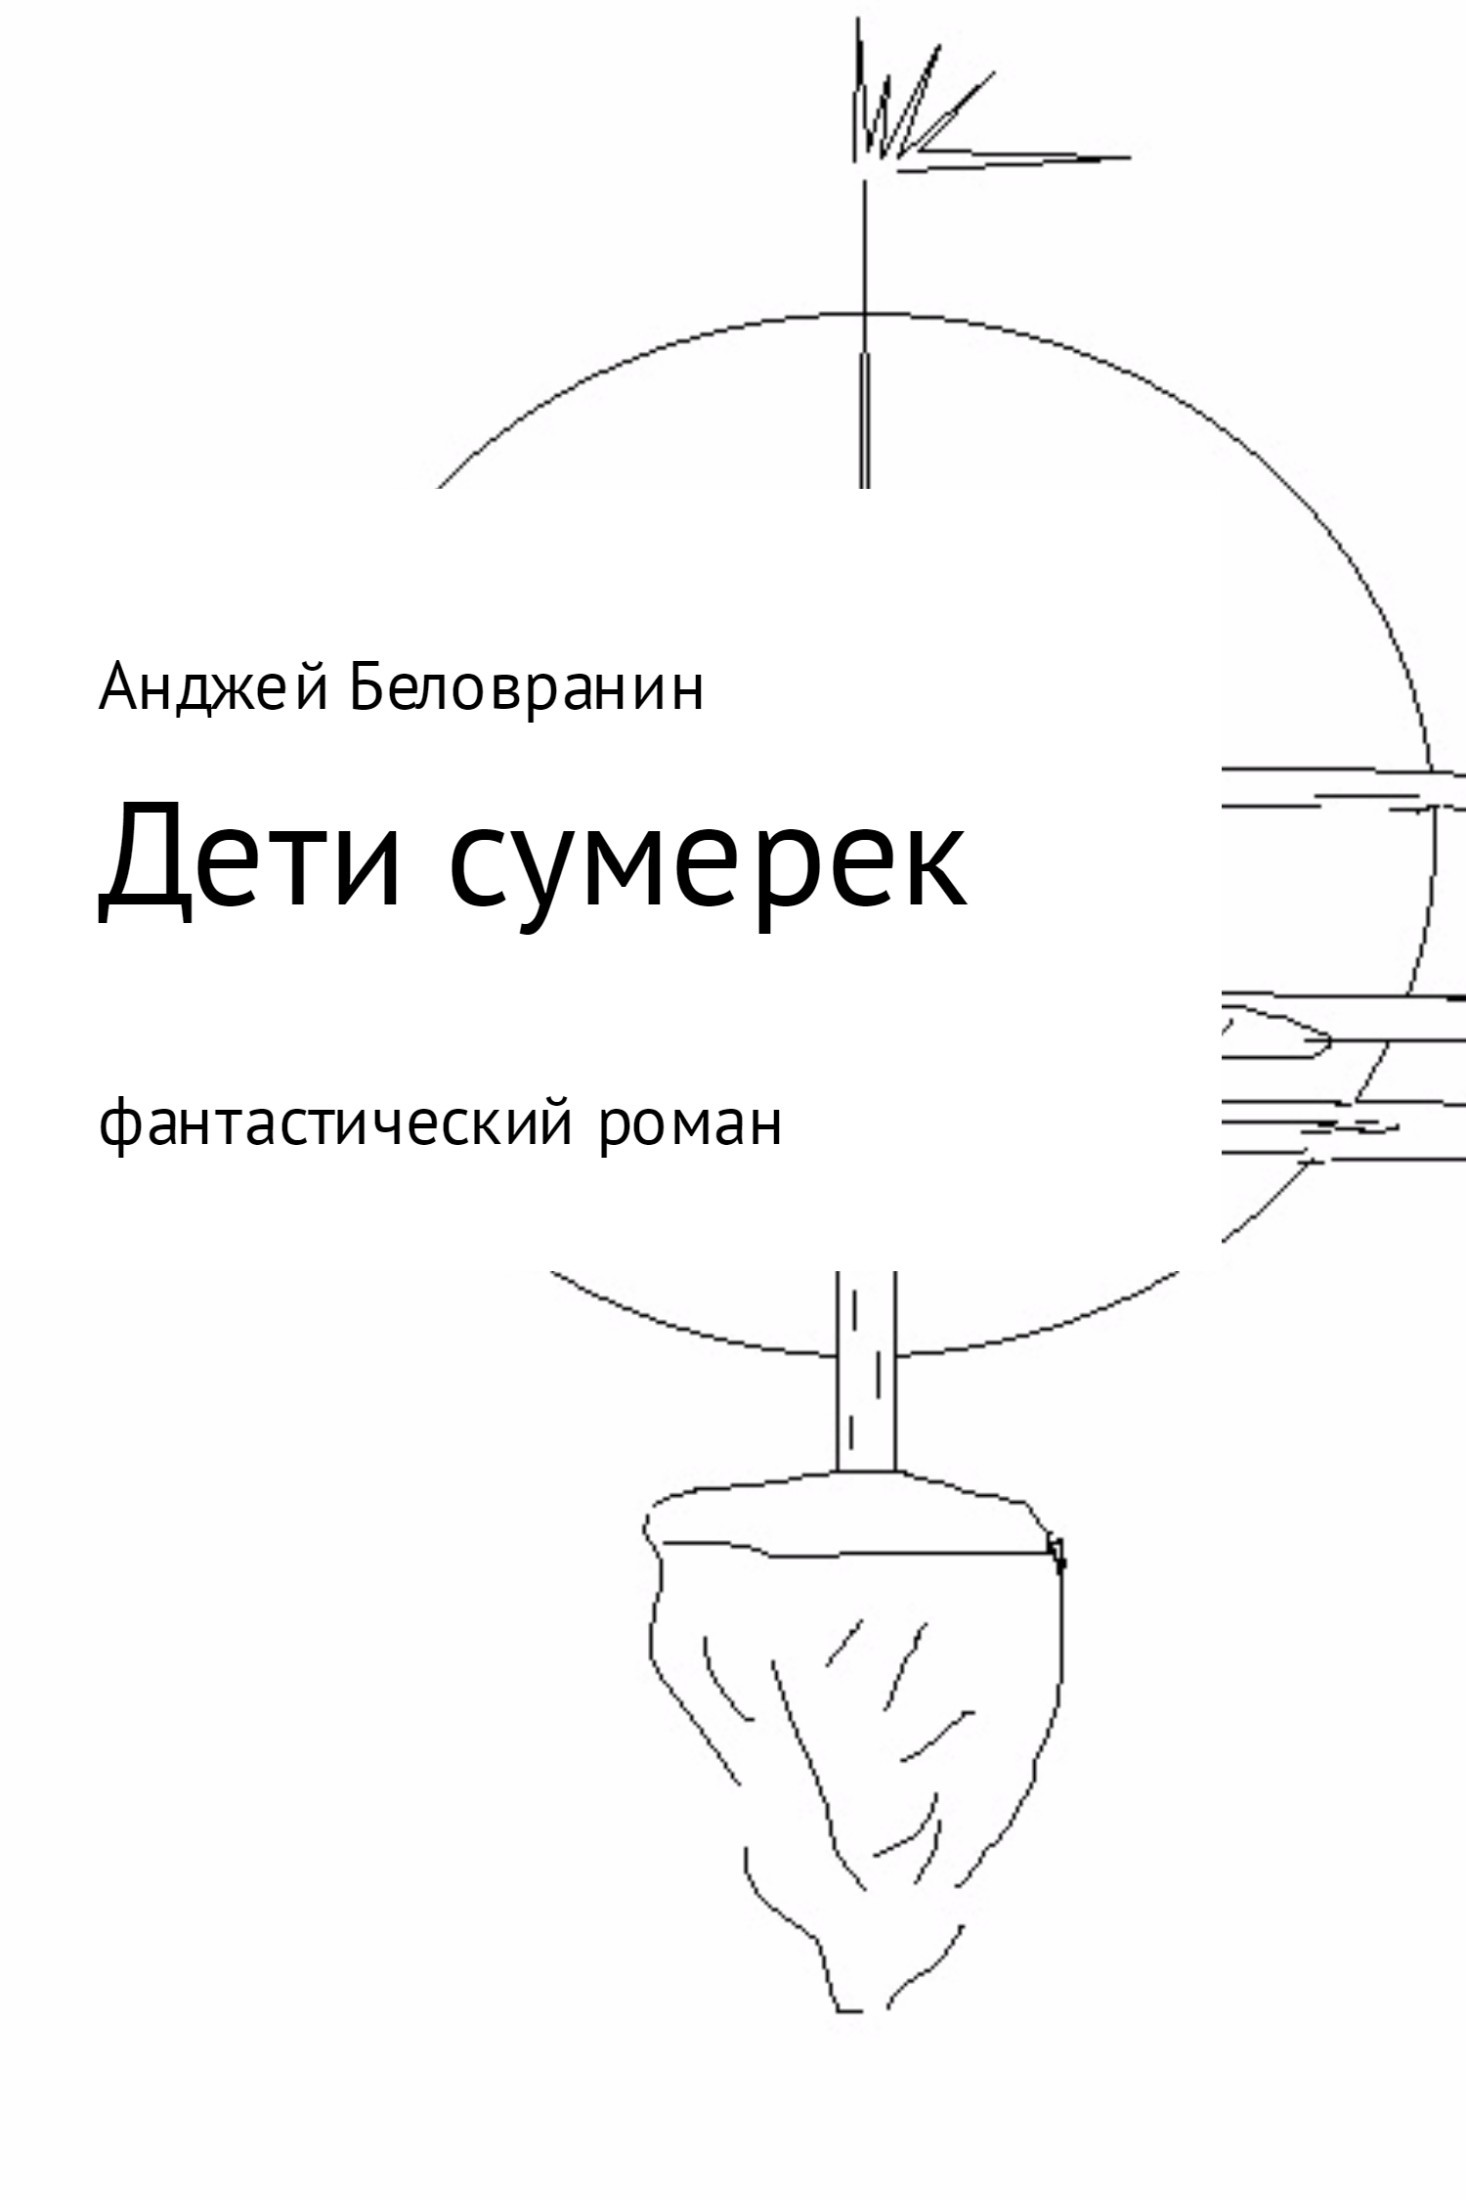 Анджей Беловранин - Дети сумерек